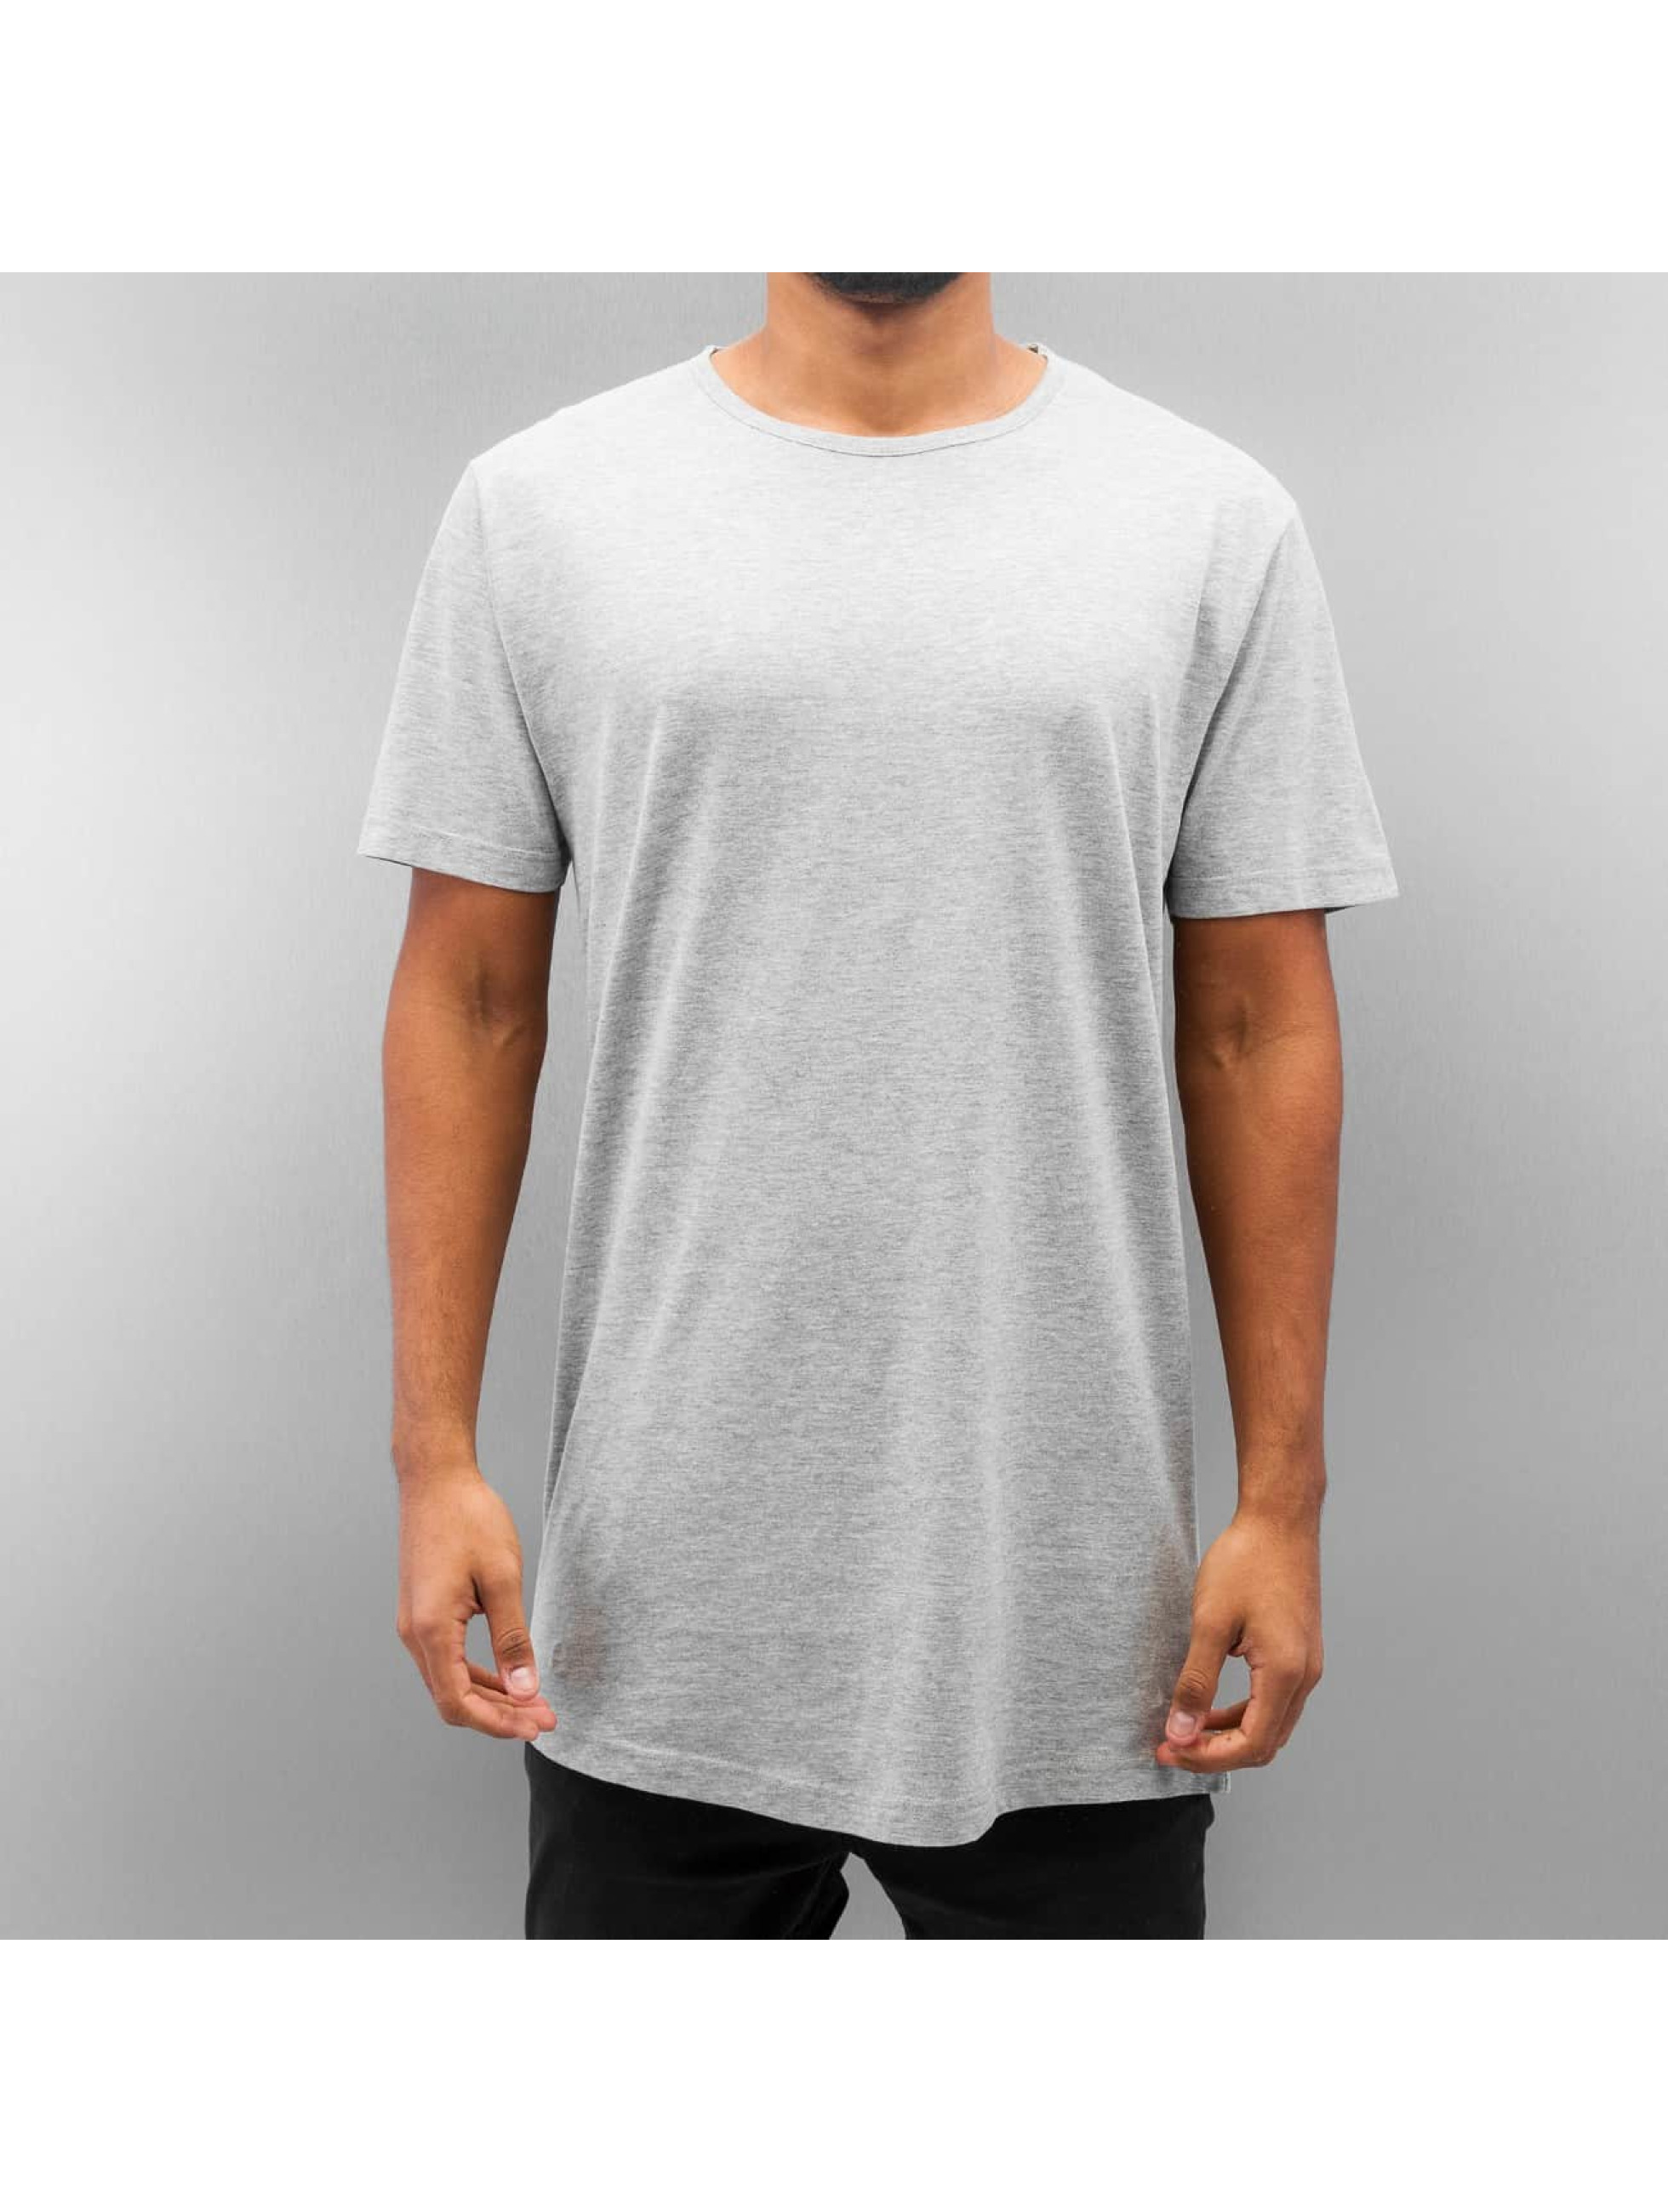 Urban Classics T-Shirt Peached Shaped Long grau